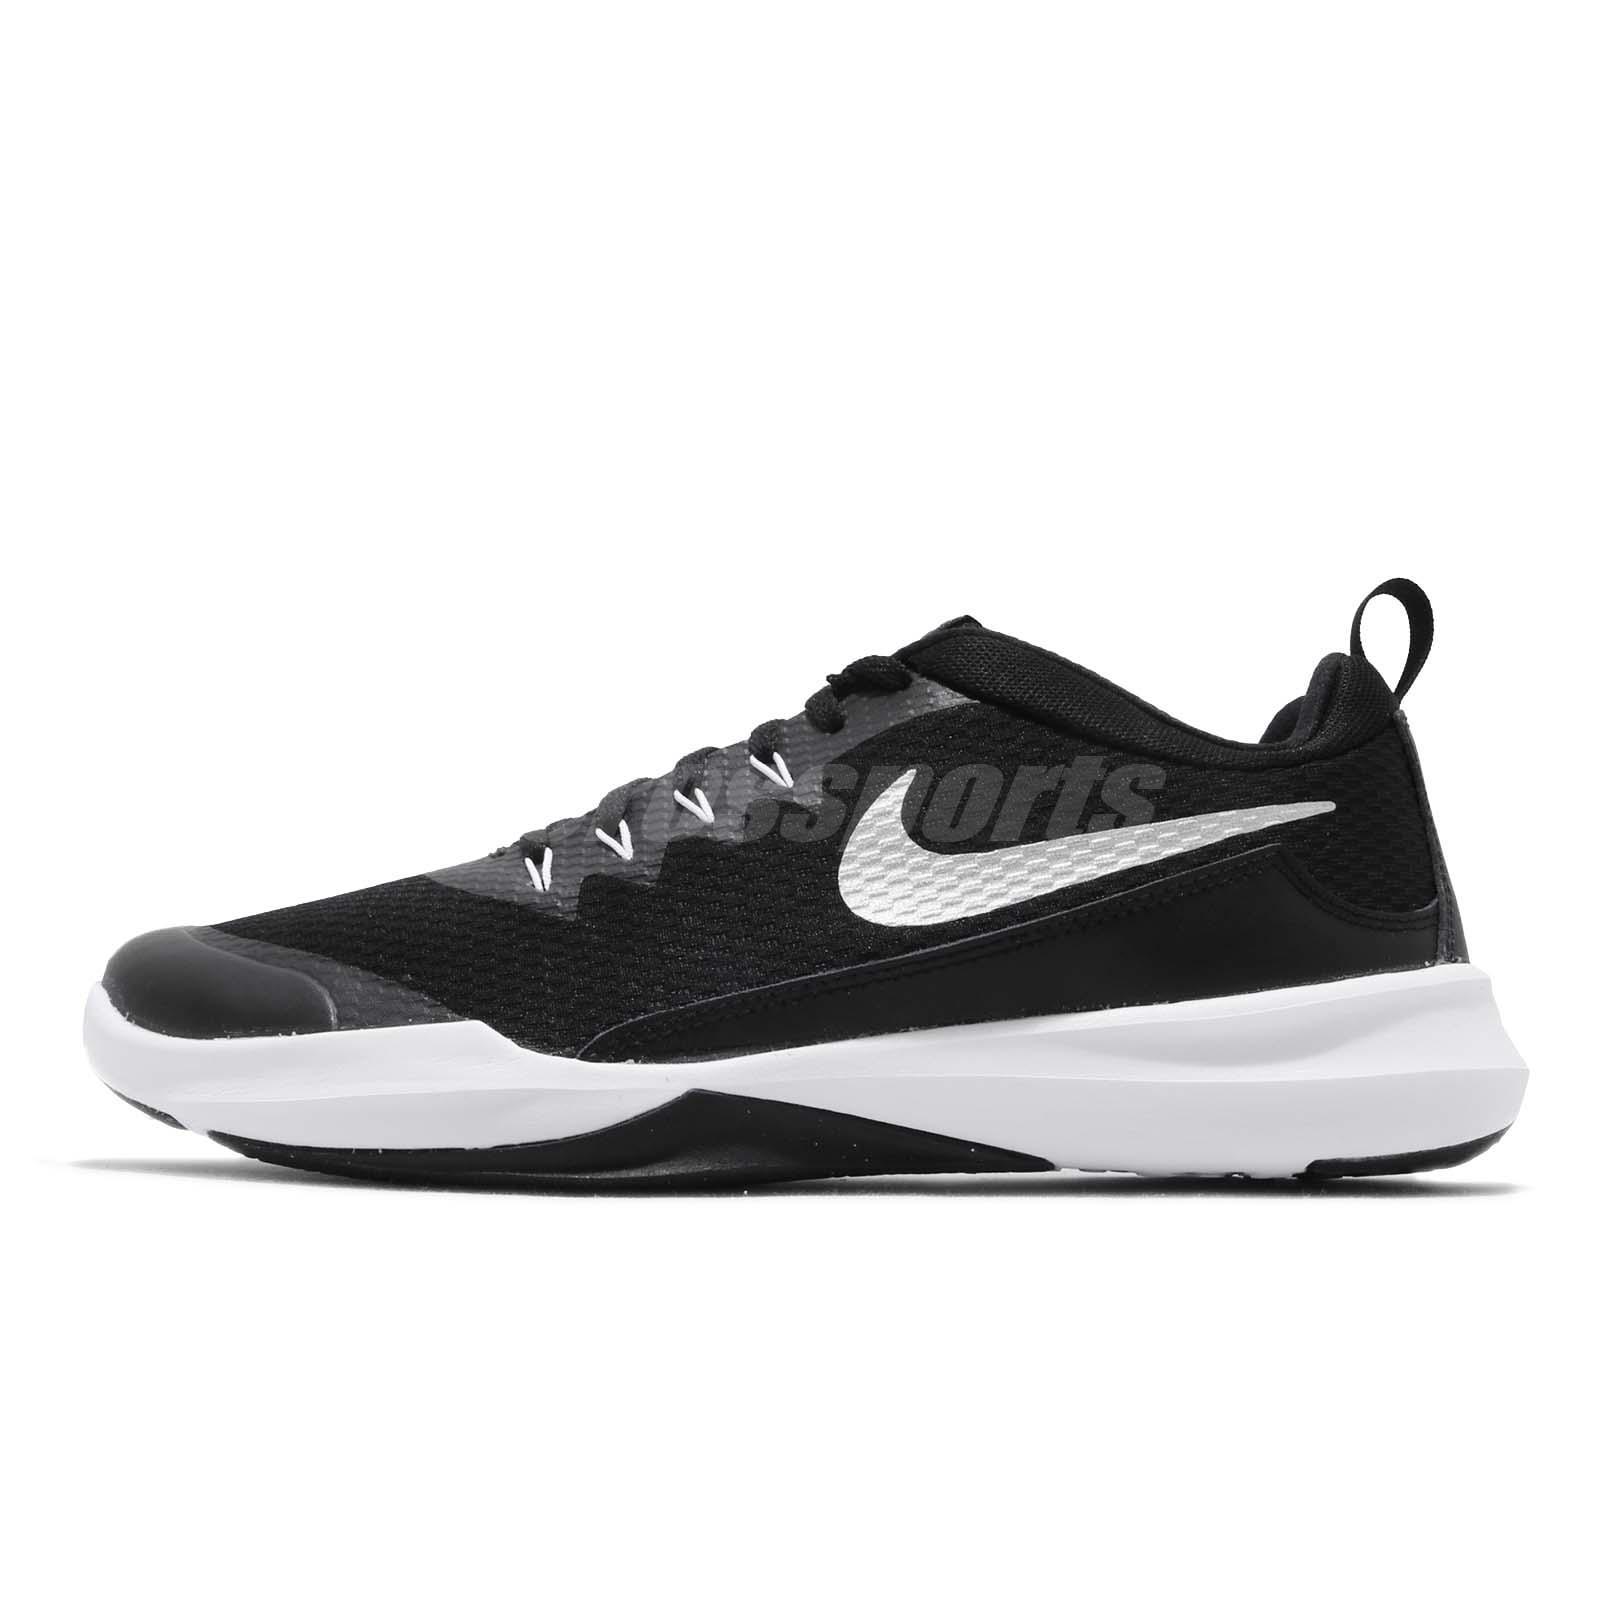 ed8edb2167a Nike Legend Trainer Black Silver White Men Cross Training Shoes 924206-001